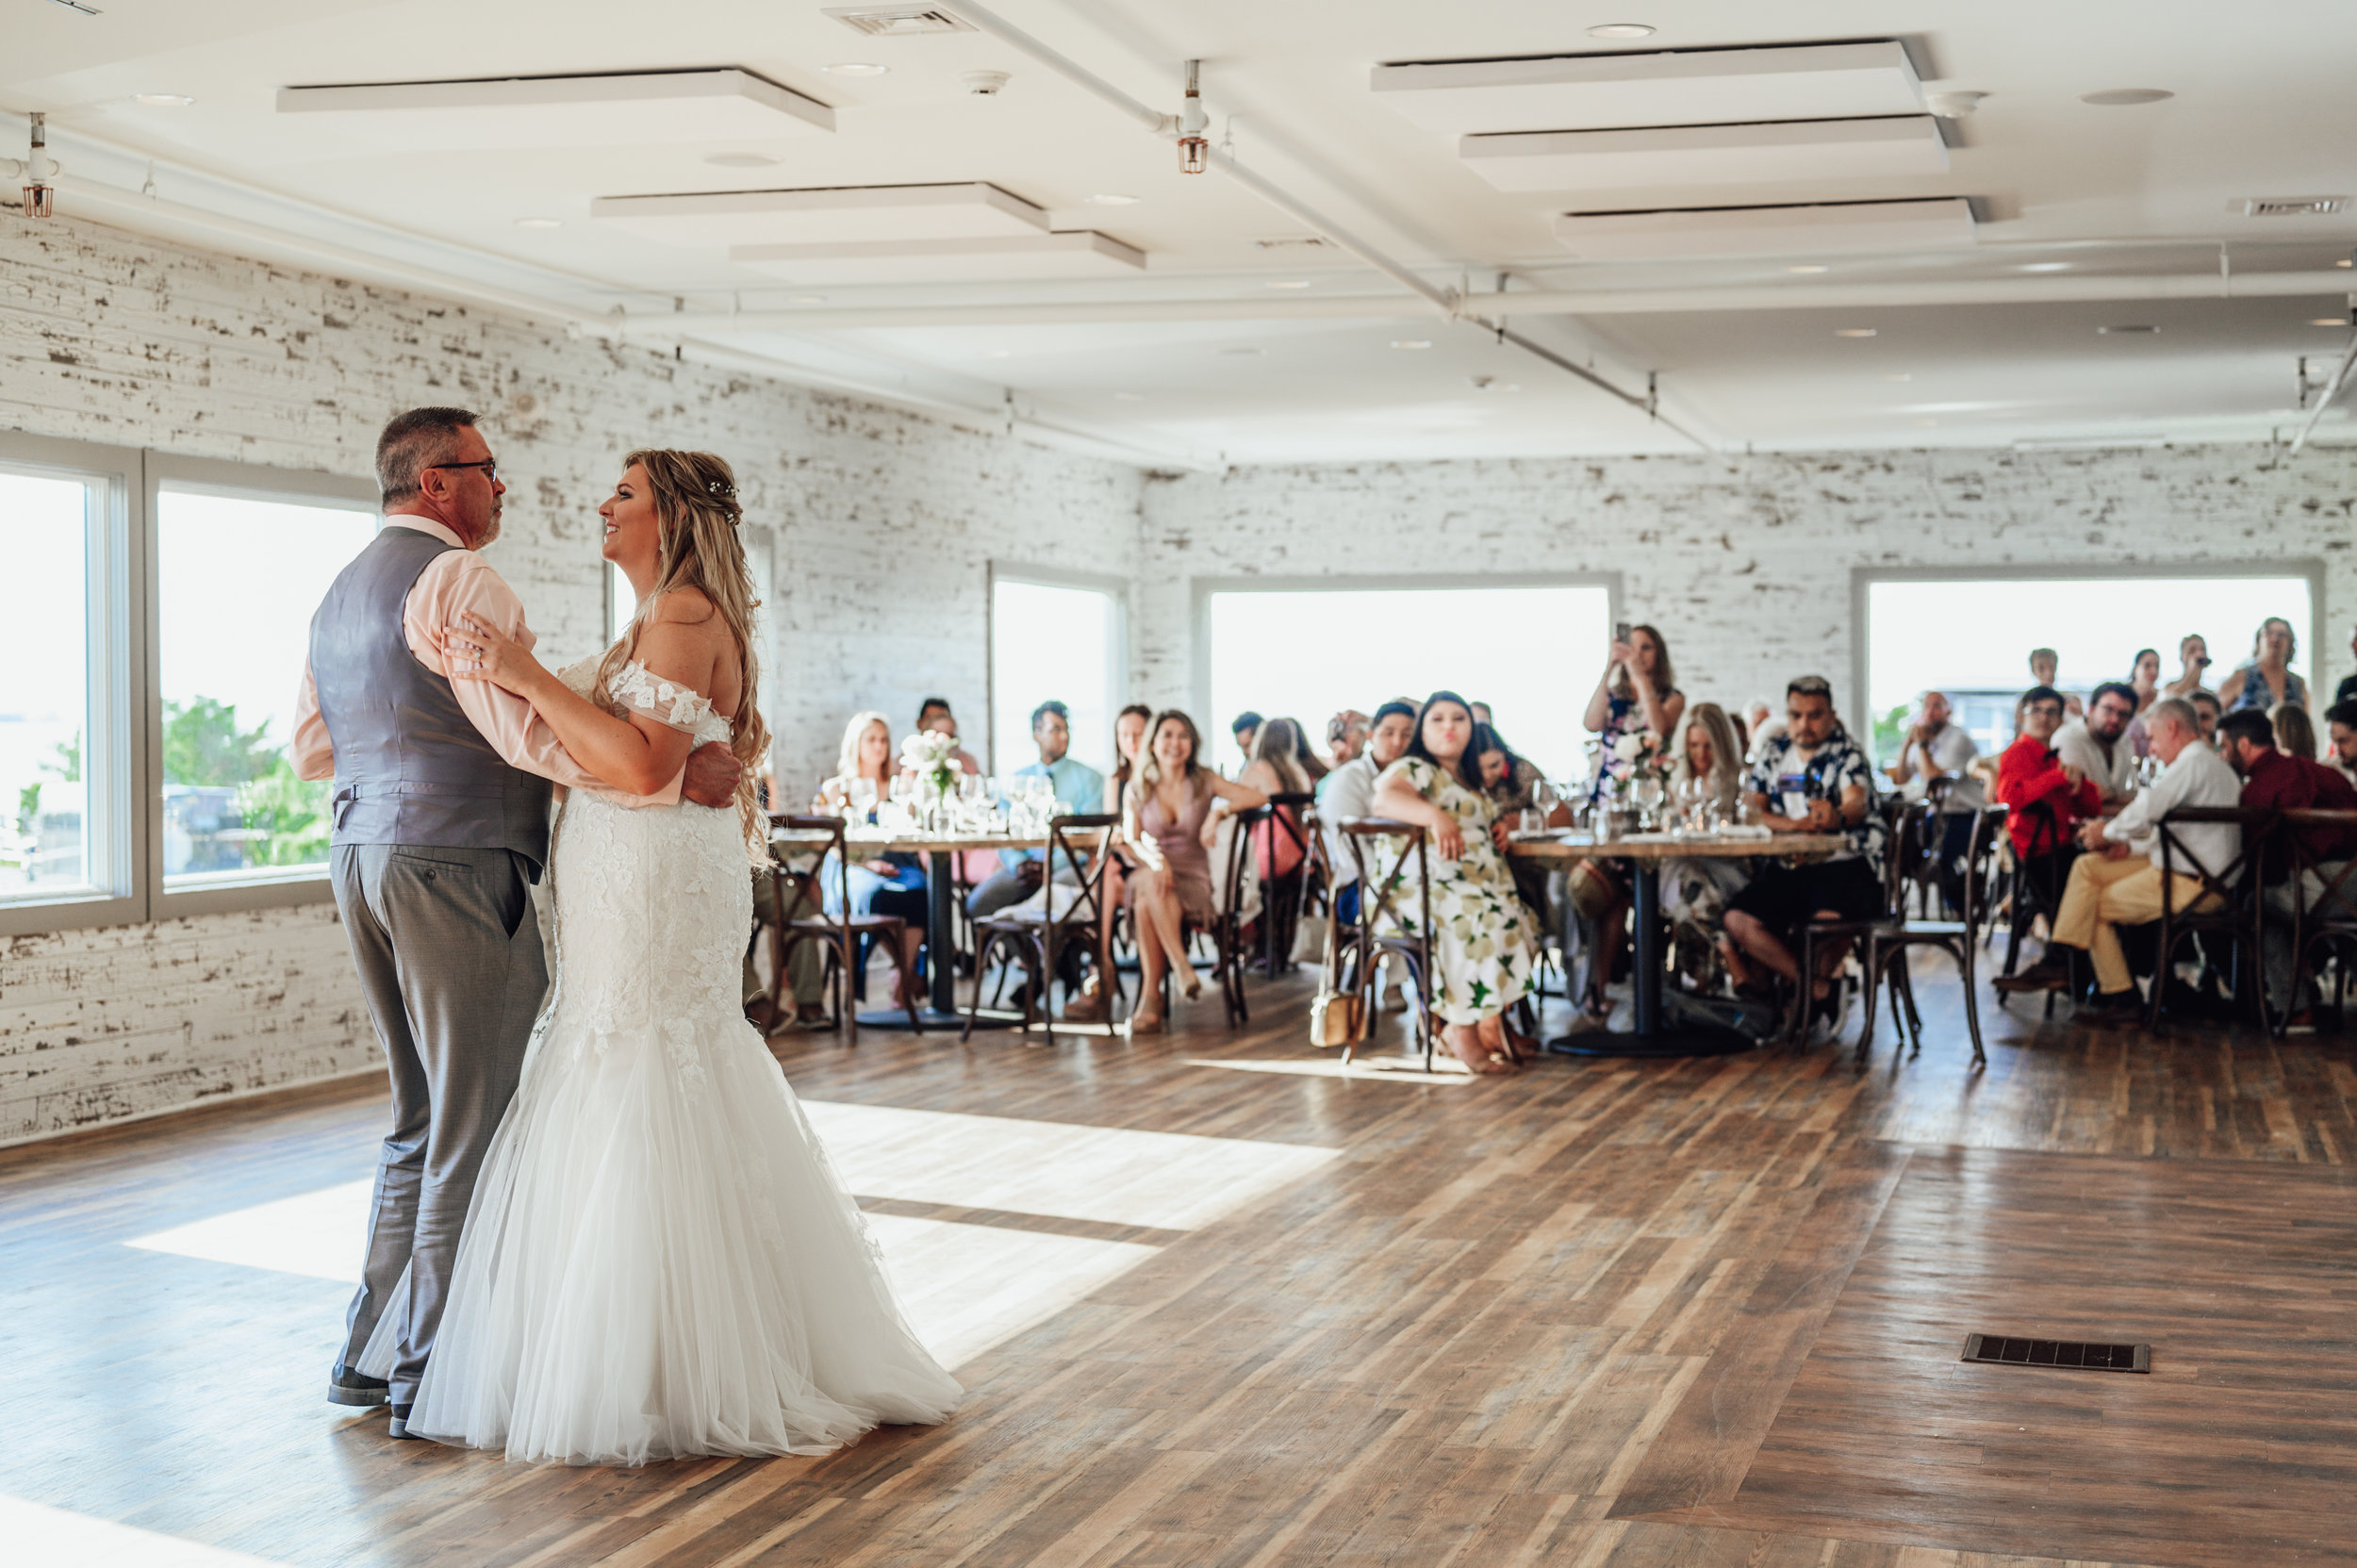 New Jersey Wedding Photographer, Felsberg Photography LBI wedding photography 95.jpg